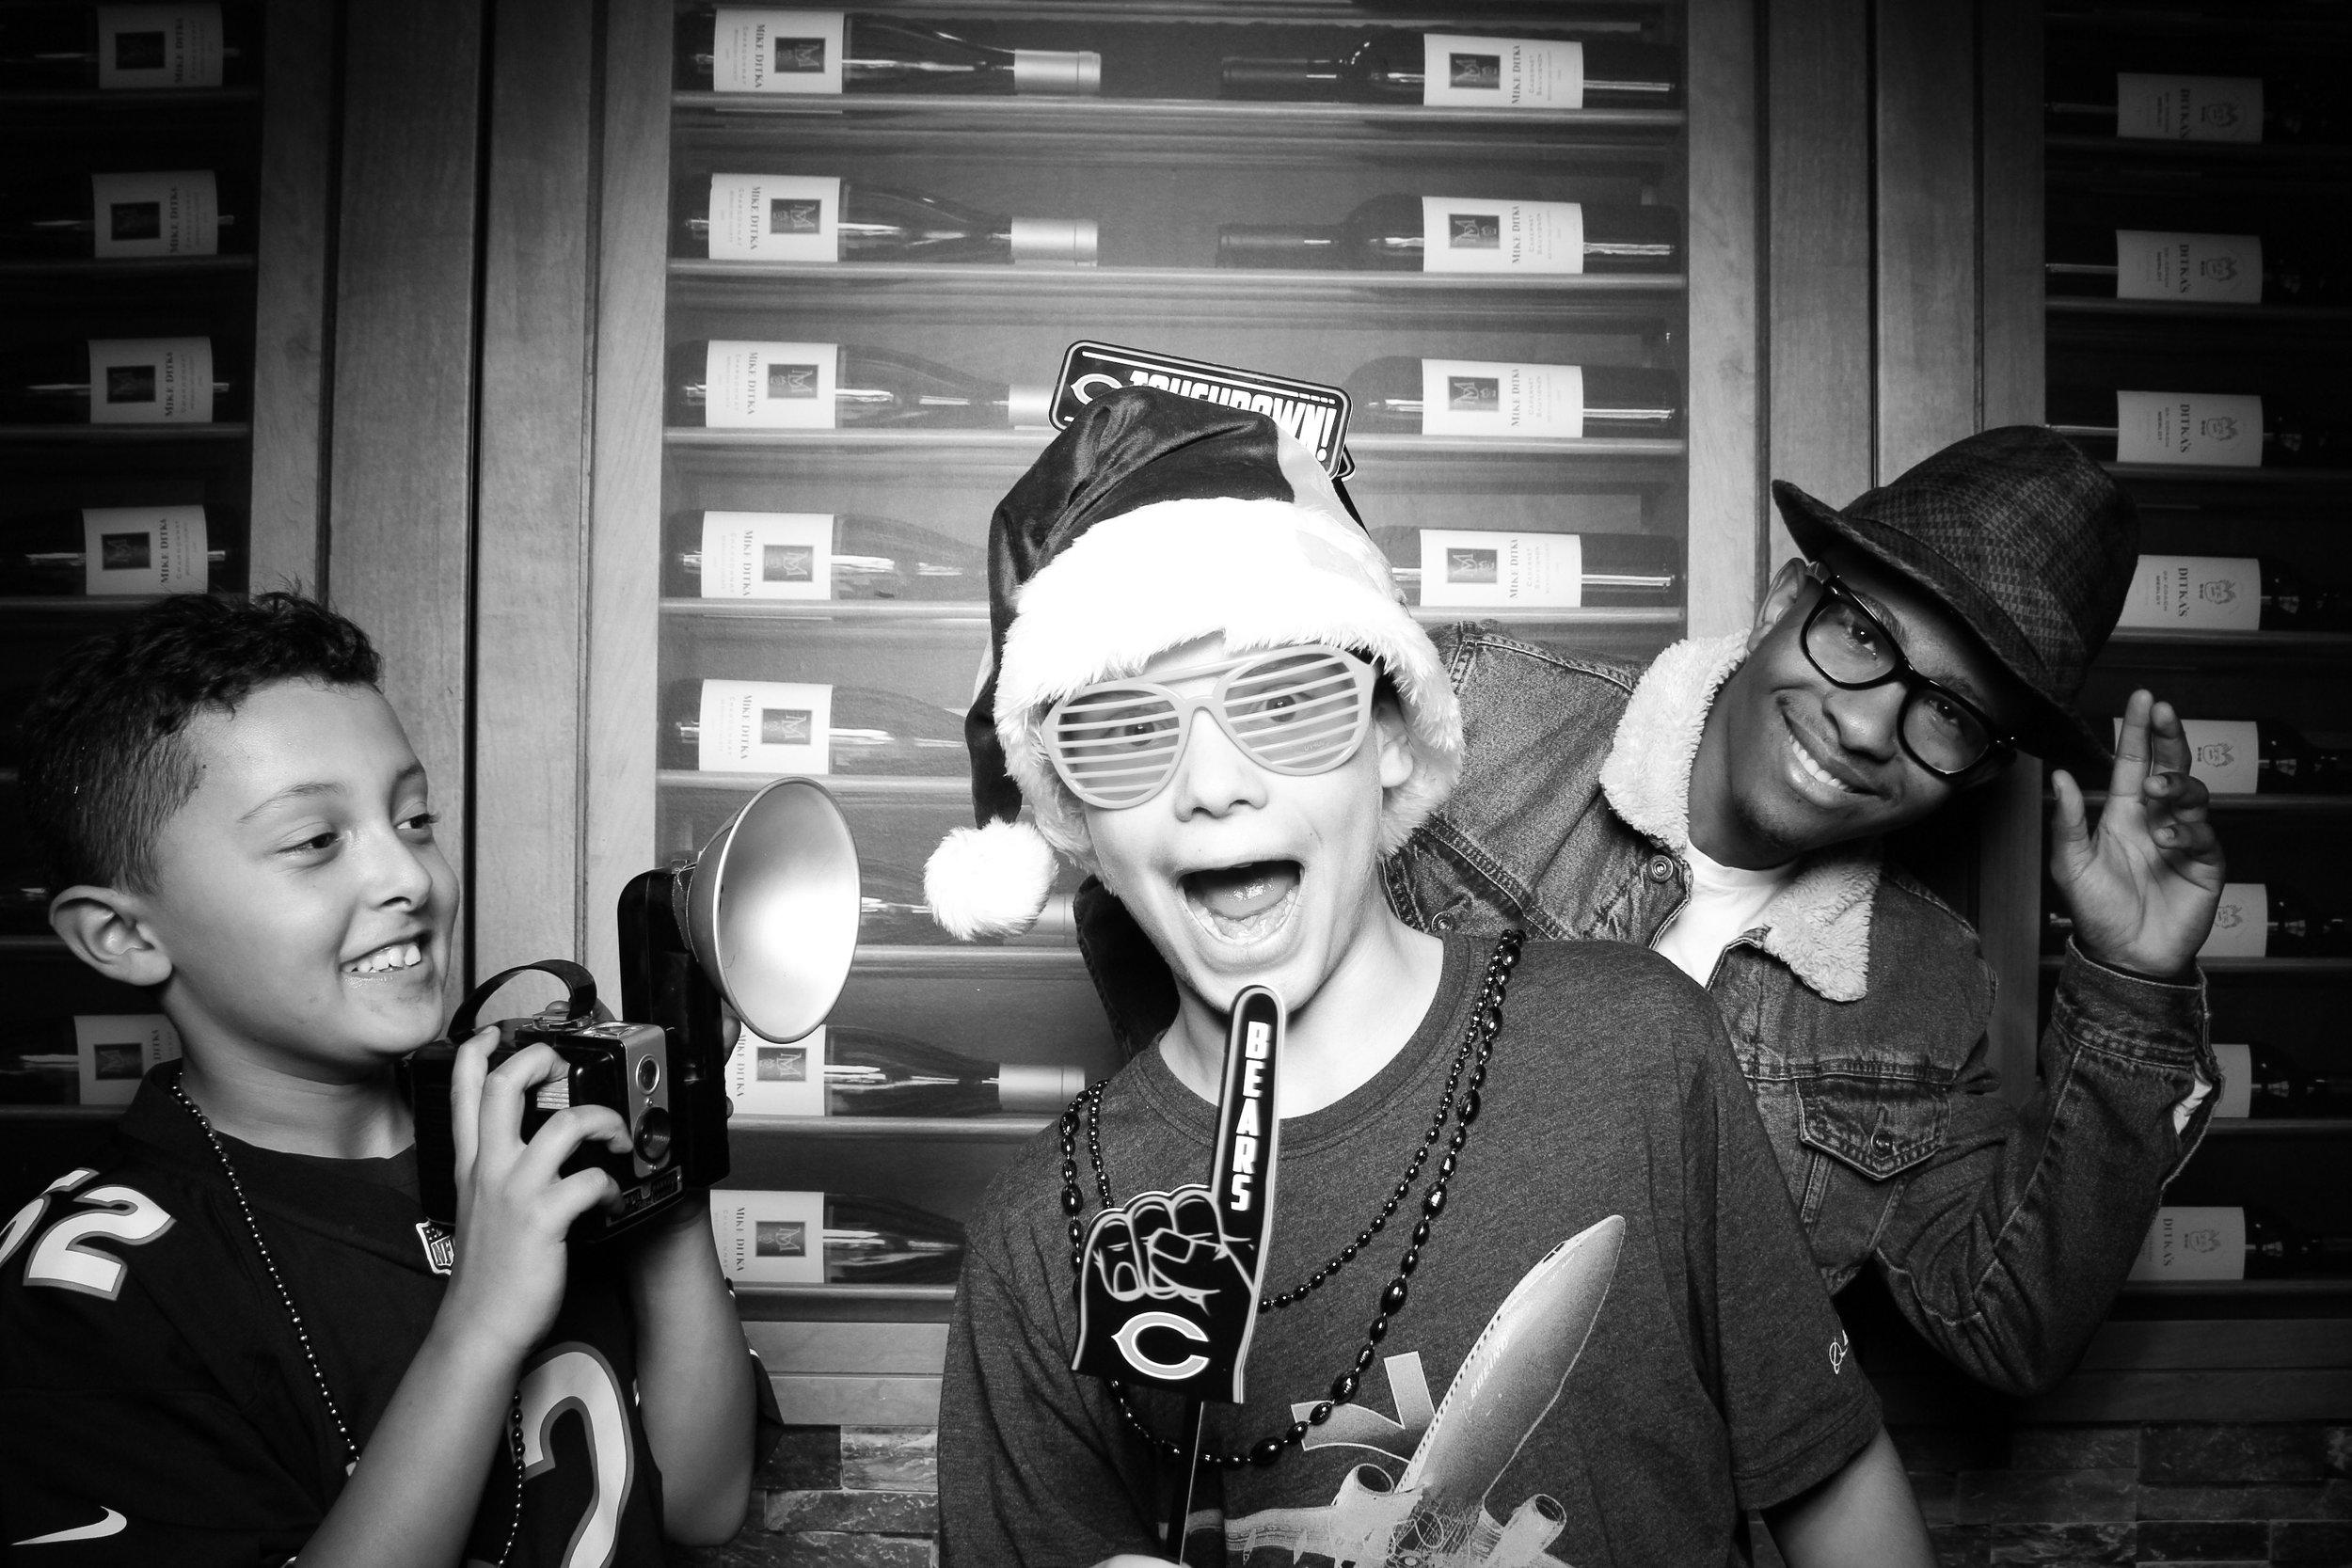 Chicago_Vintage_Photobooth_Ditkas_Birthday_Party_30.jpg